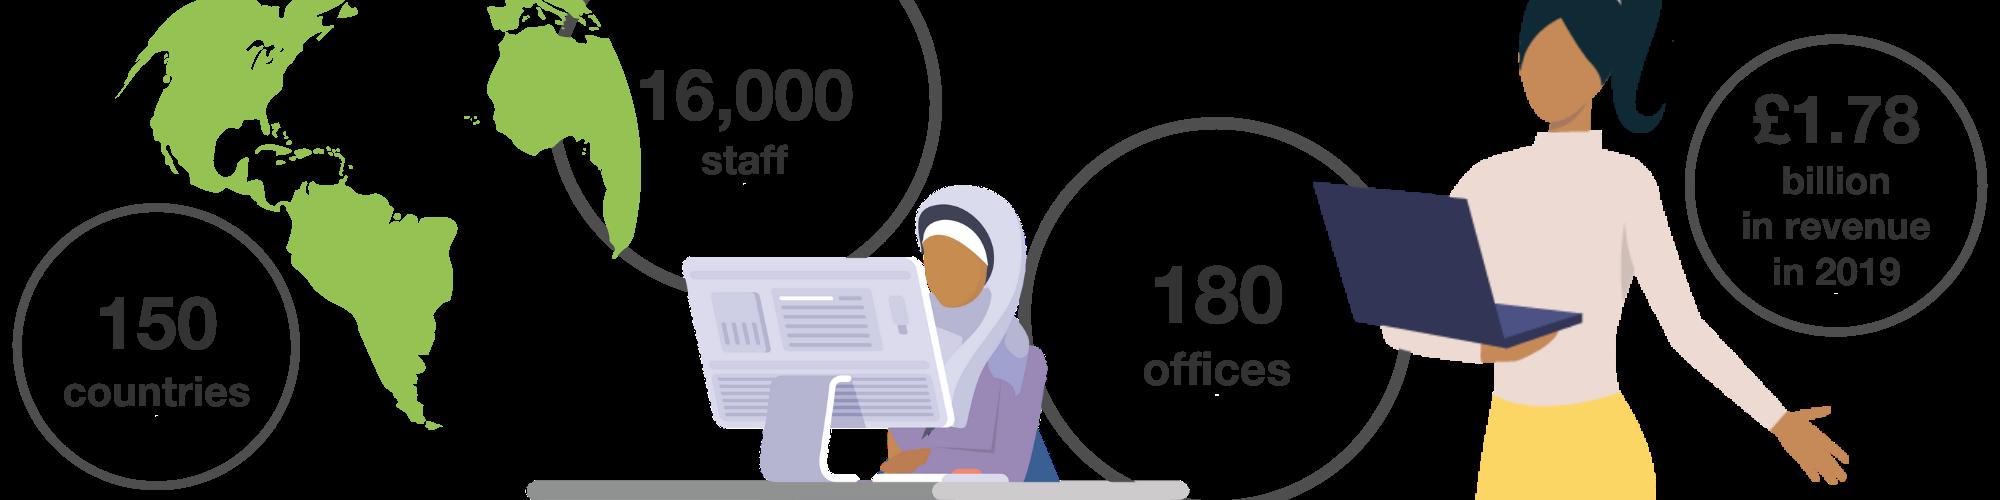 Mott MacDonald case study statistics: 150 offices, 16,000 staff, 180 offices, 1.78 billion in revenue in 2019